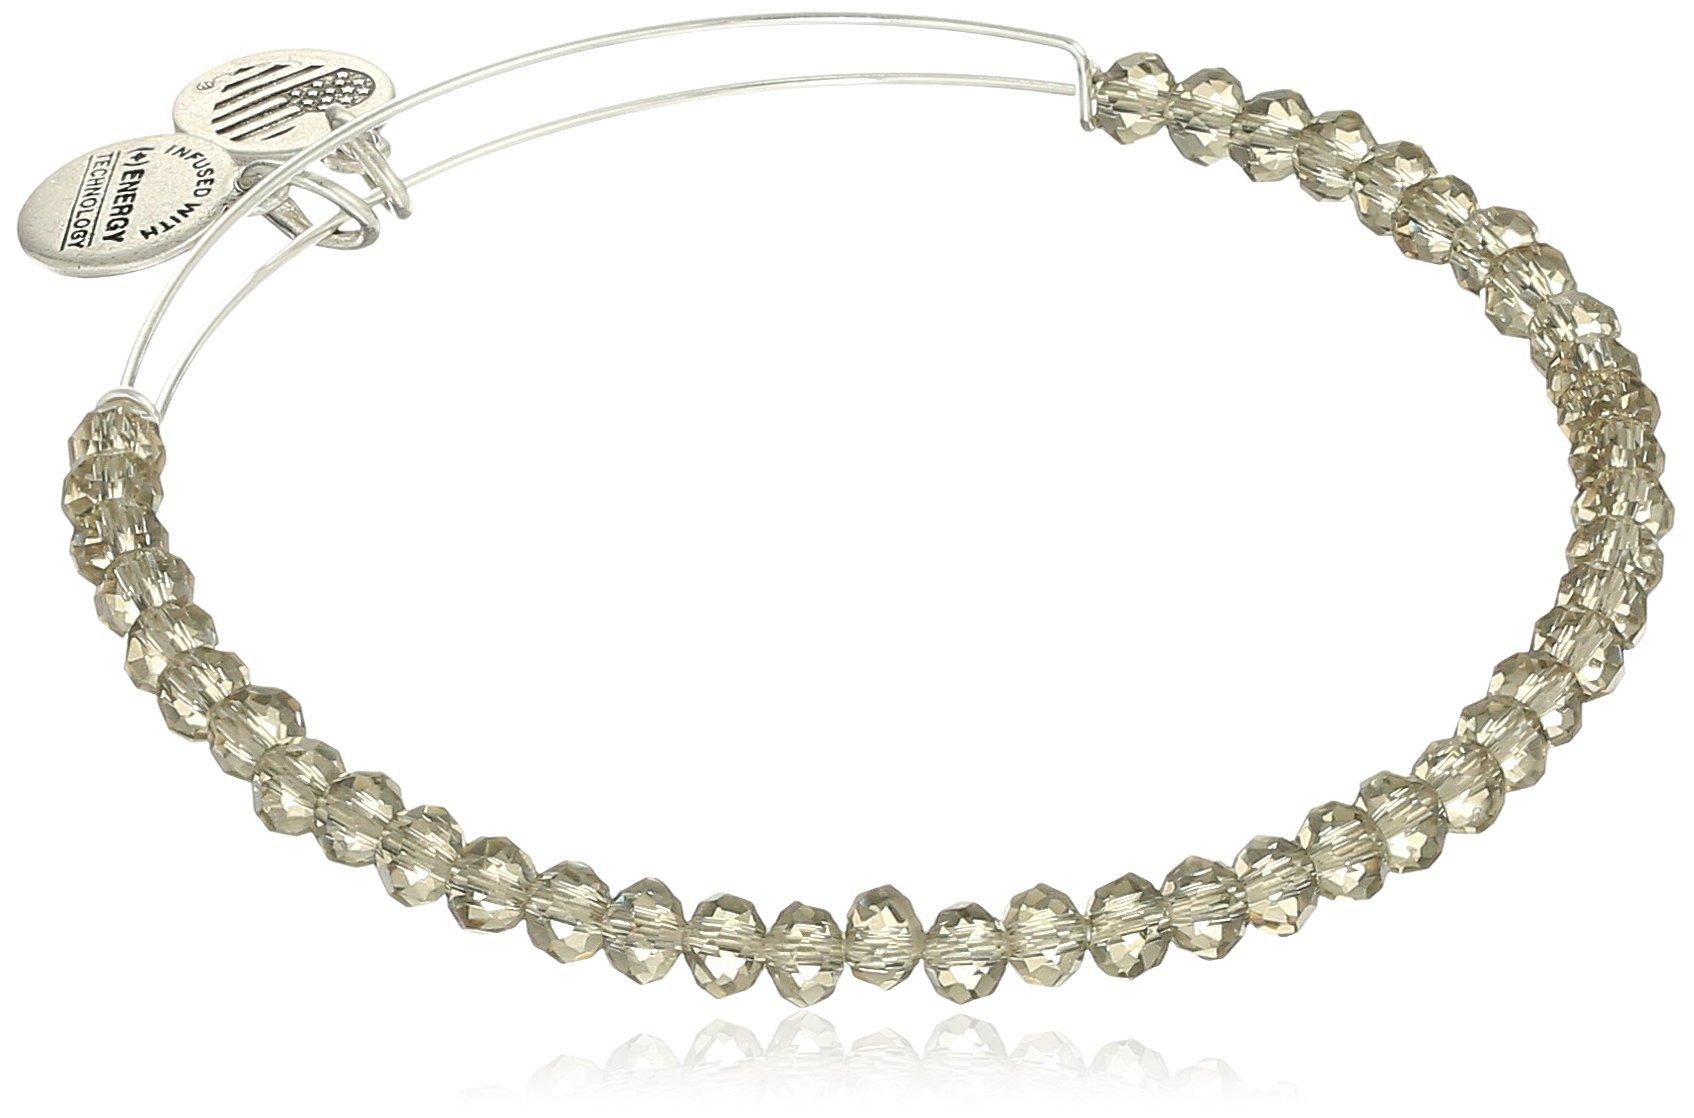 Alex and Ani Brilliance Bead Crescent Moon Blush/Shinny Silver Bracelet